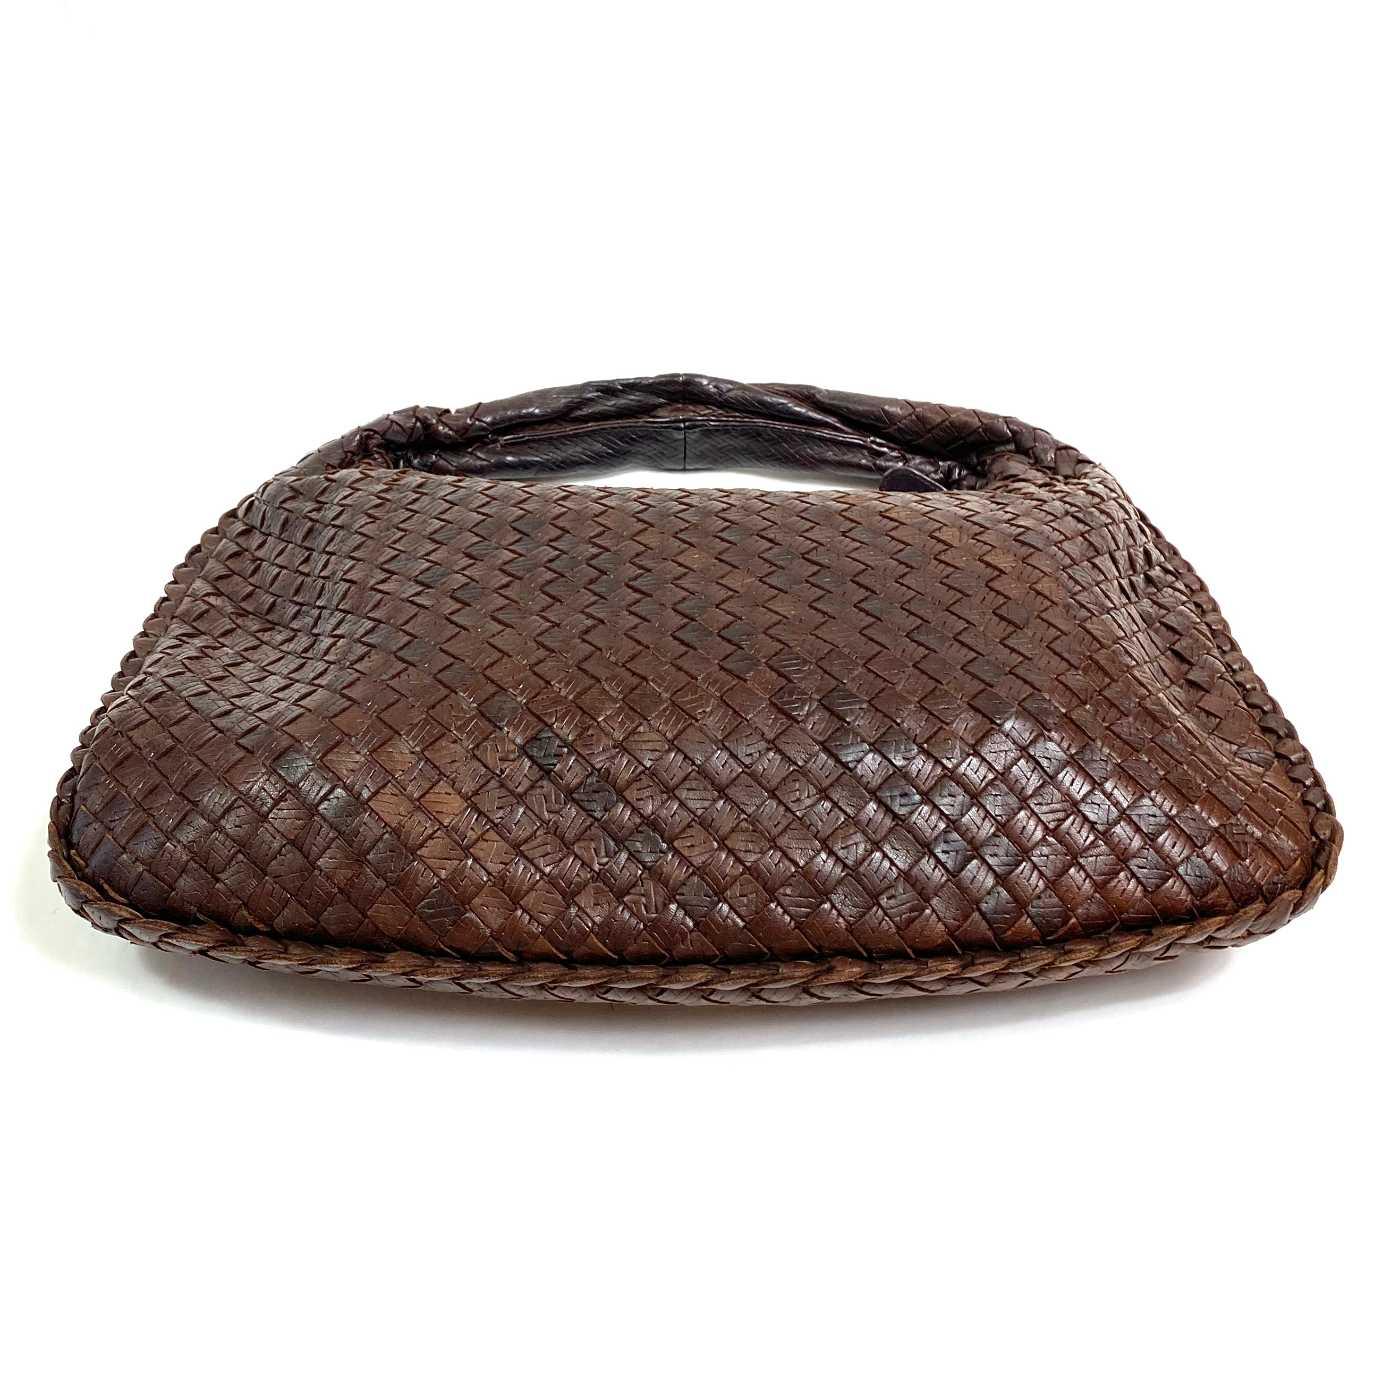 Bolsa Bottega Veneta Hobo Textured Intrecciato Marrom